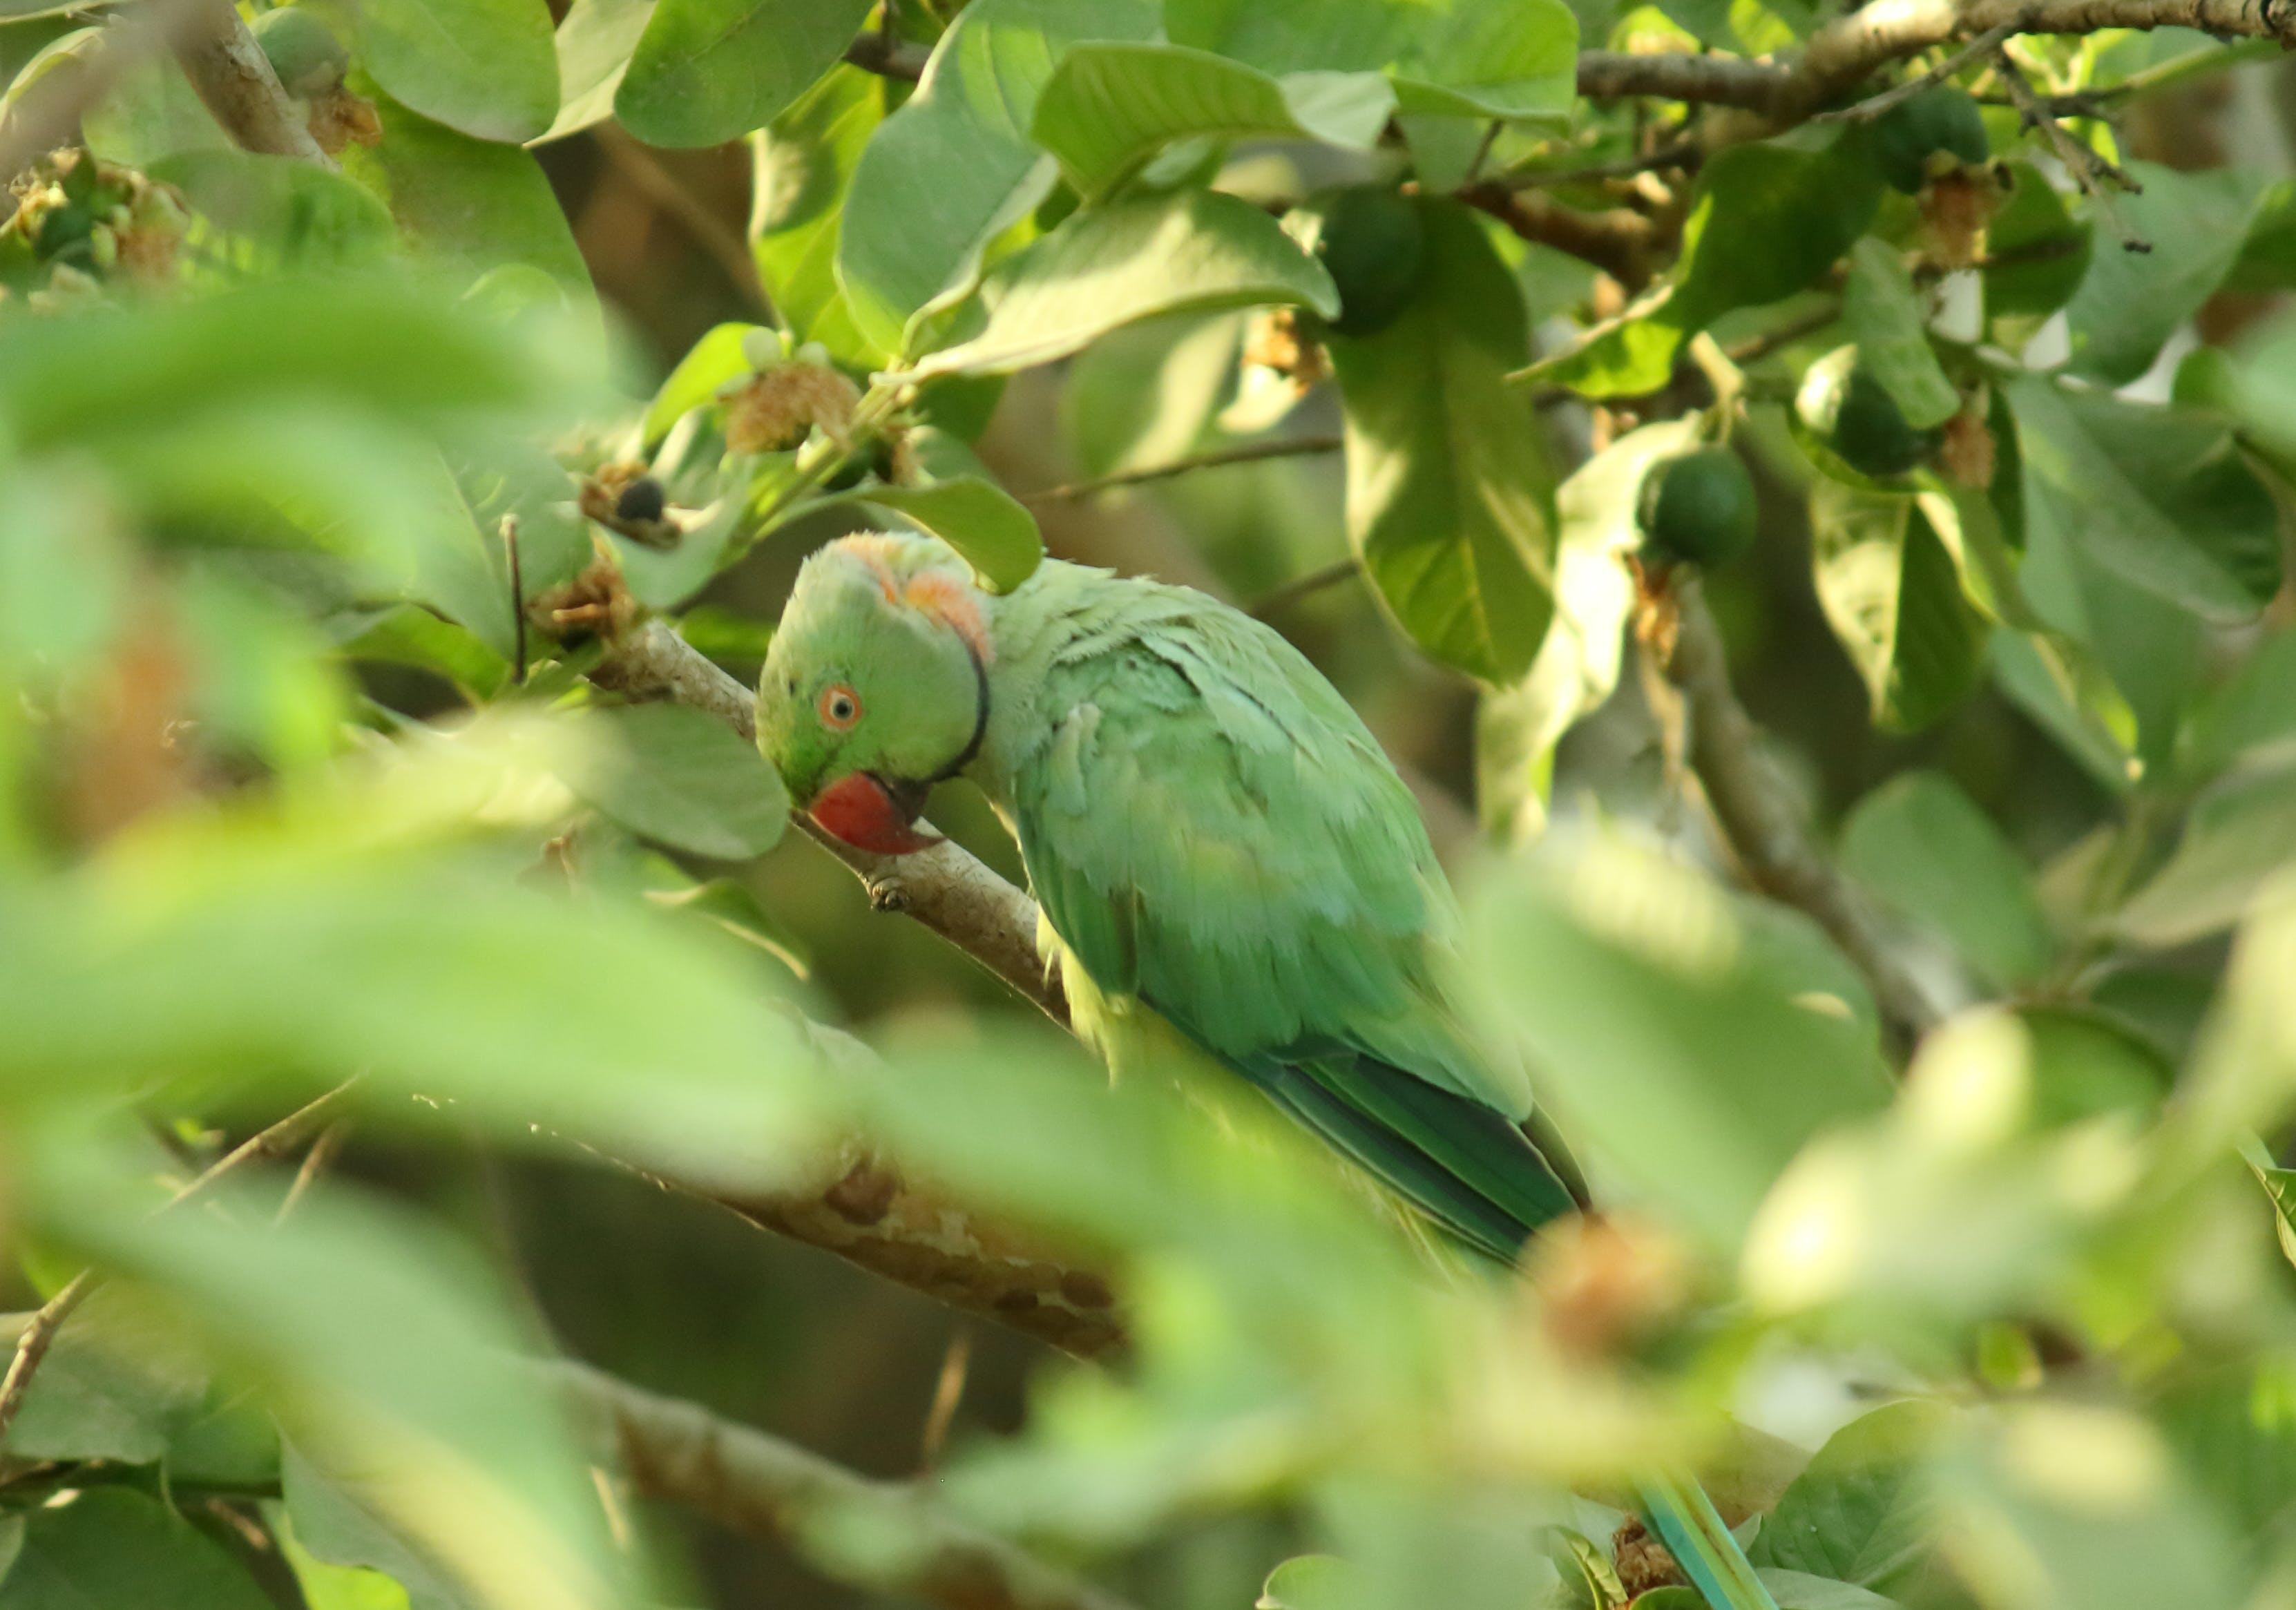 Foto d'estoc gratuïta de #parrot #bird #birds #parrots #birdsofinstagram, #parrotsofinstagram #pet #animals #love #cute #ani, #petsofinstagram #parrotlover #macaw #cockatoo # in, #udaipur #greenery #parrot